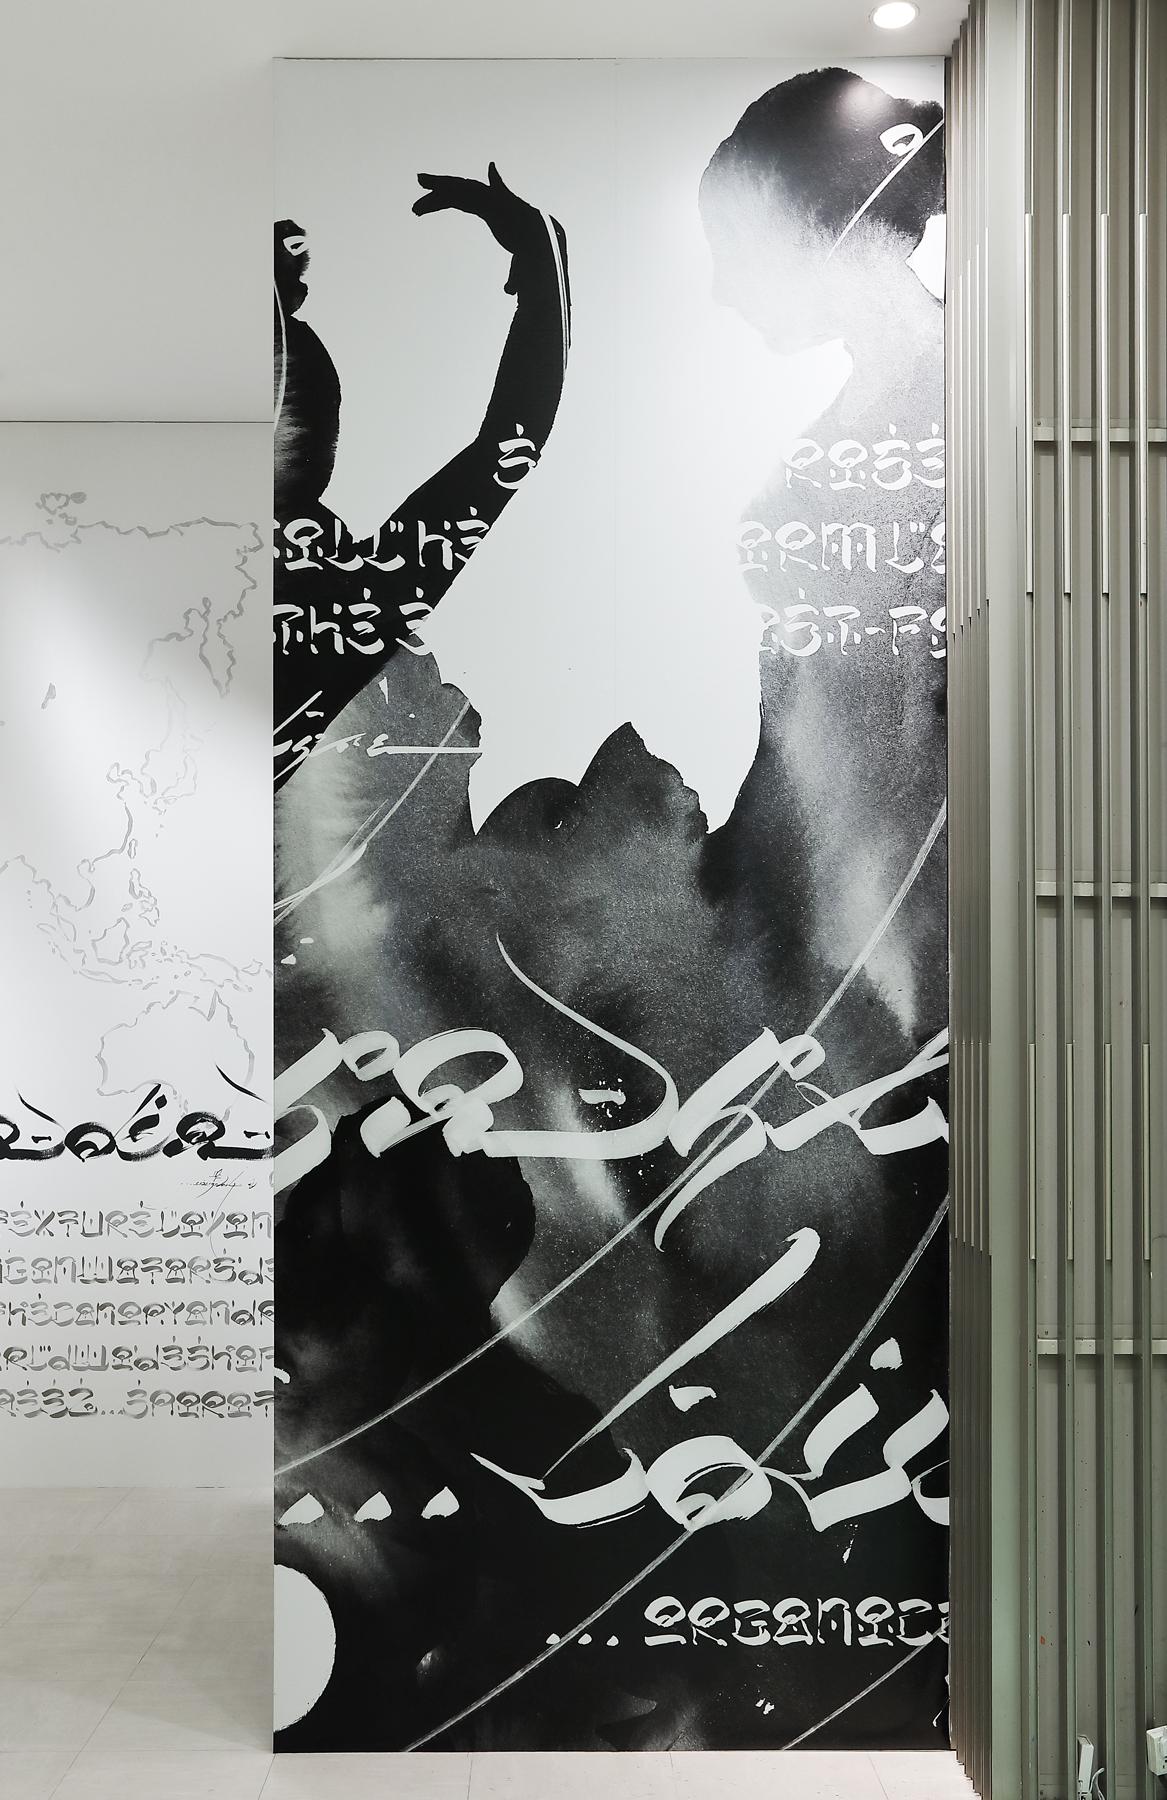 SEIBU SHIBUYA - Hand painted wall with wall wrapping | Tokyo, Japan, 2021